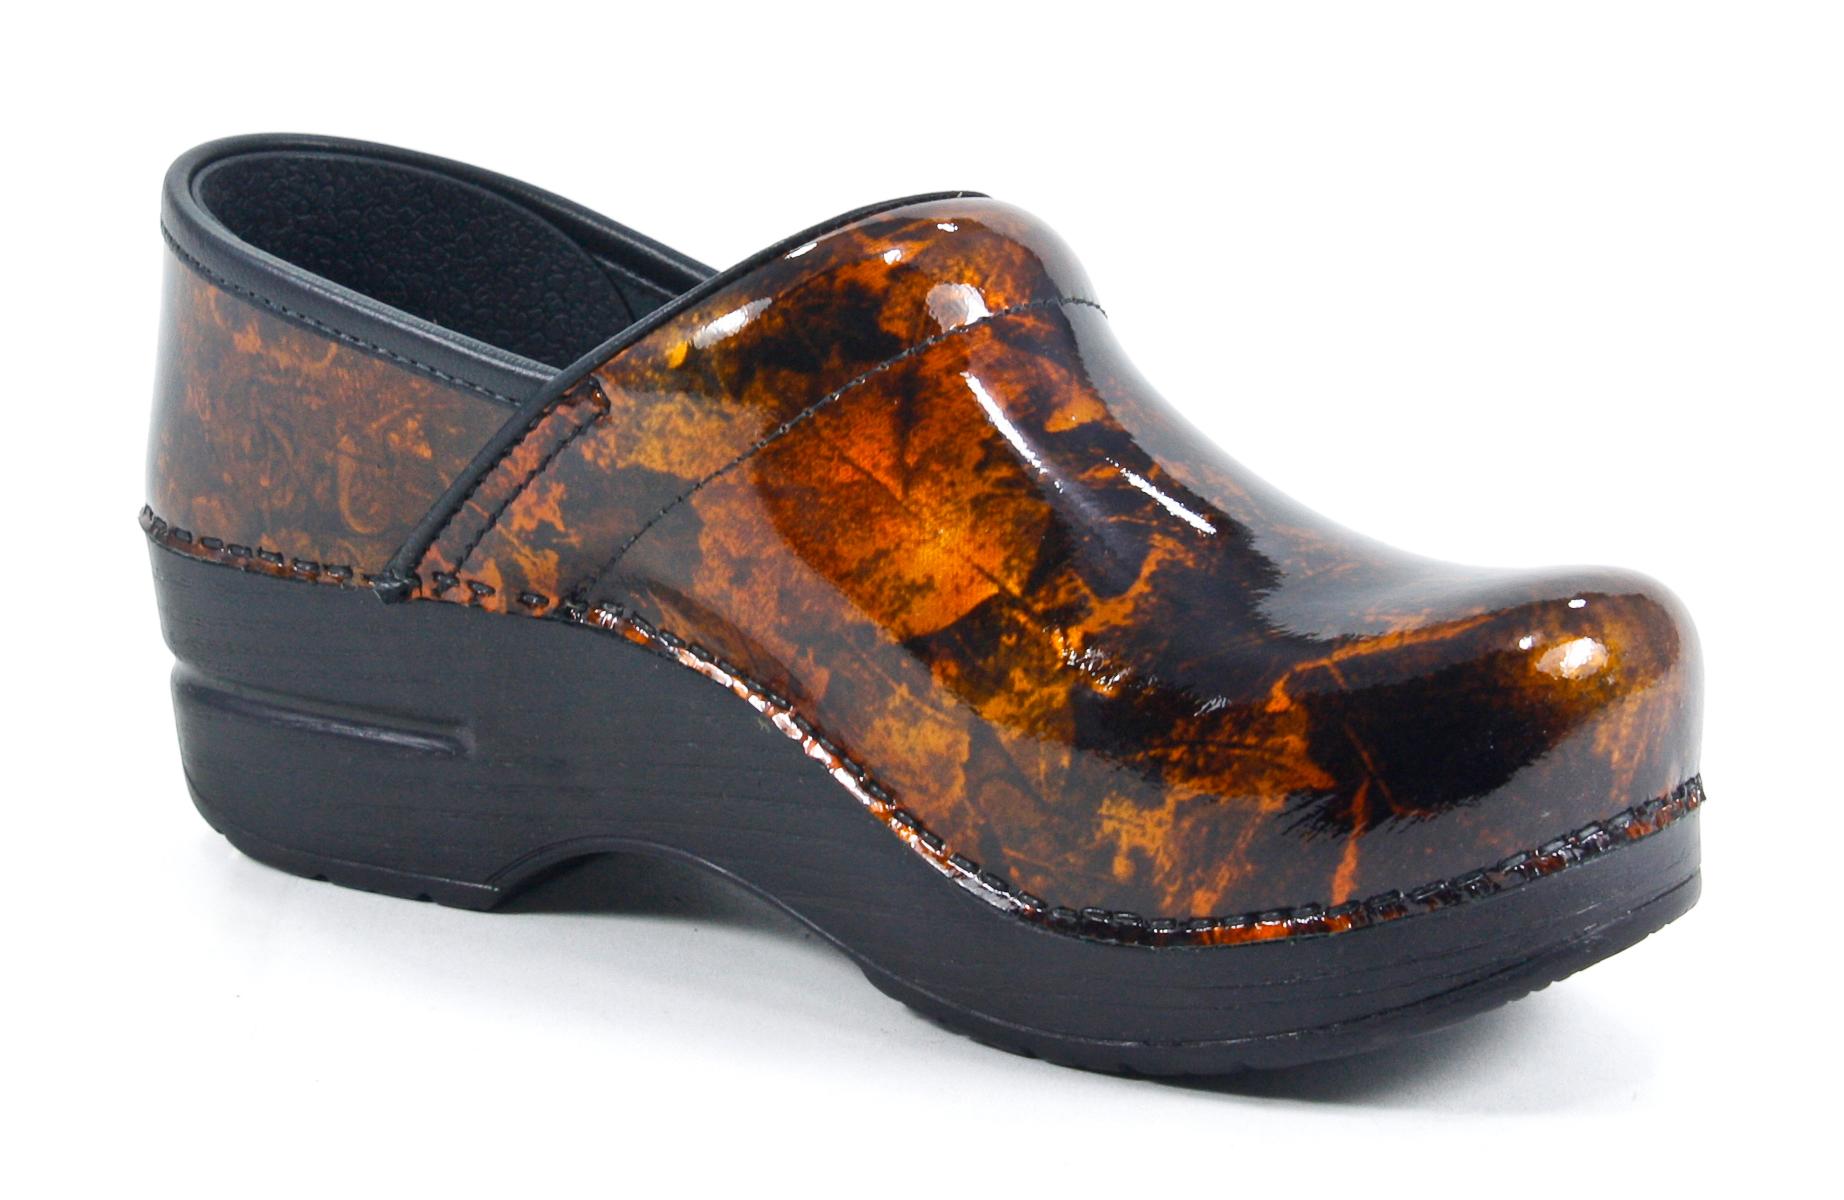 Dansko Clog Sandals Sale